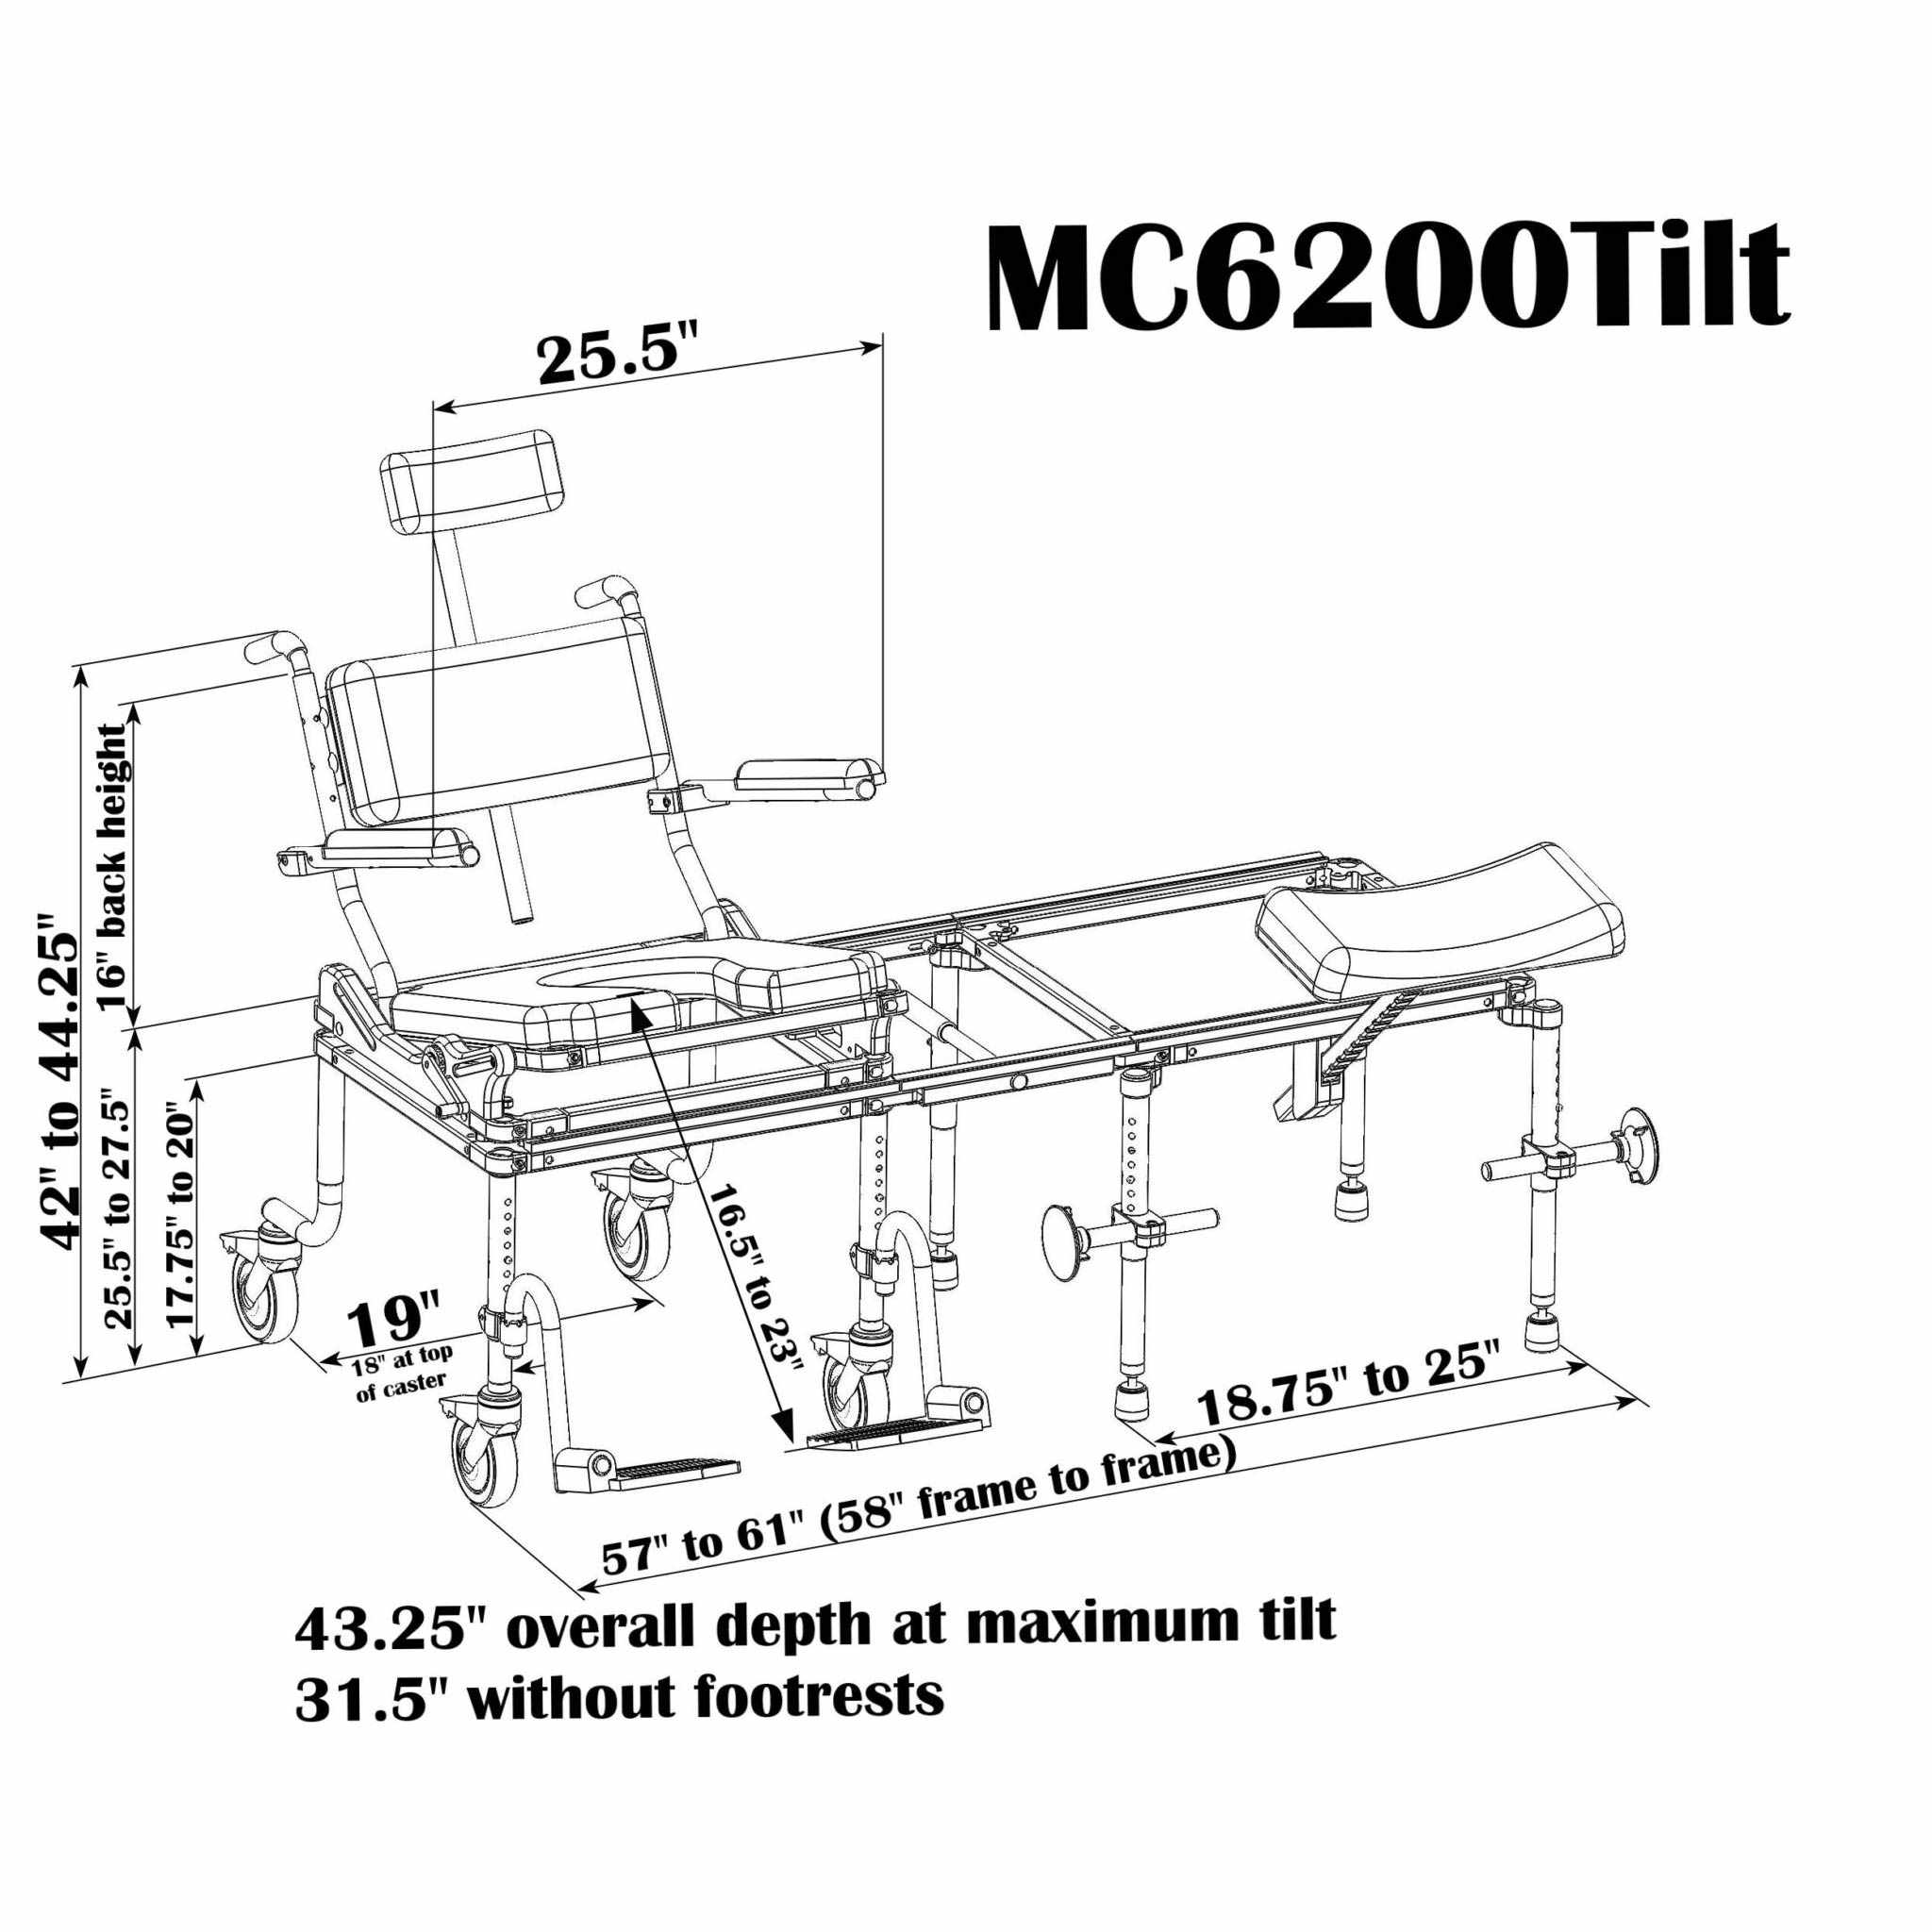 Nuprodx multichair 6200tilt tub slider system